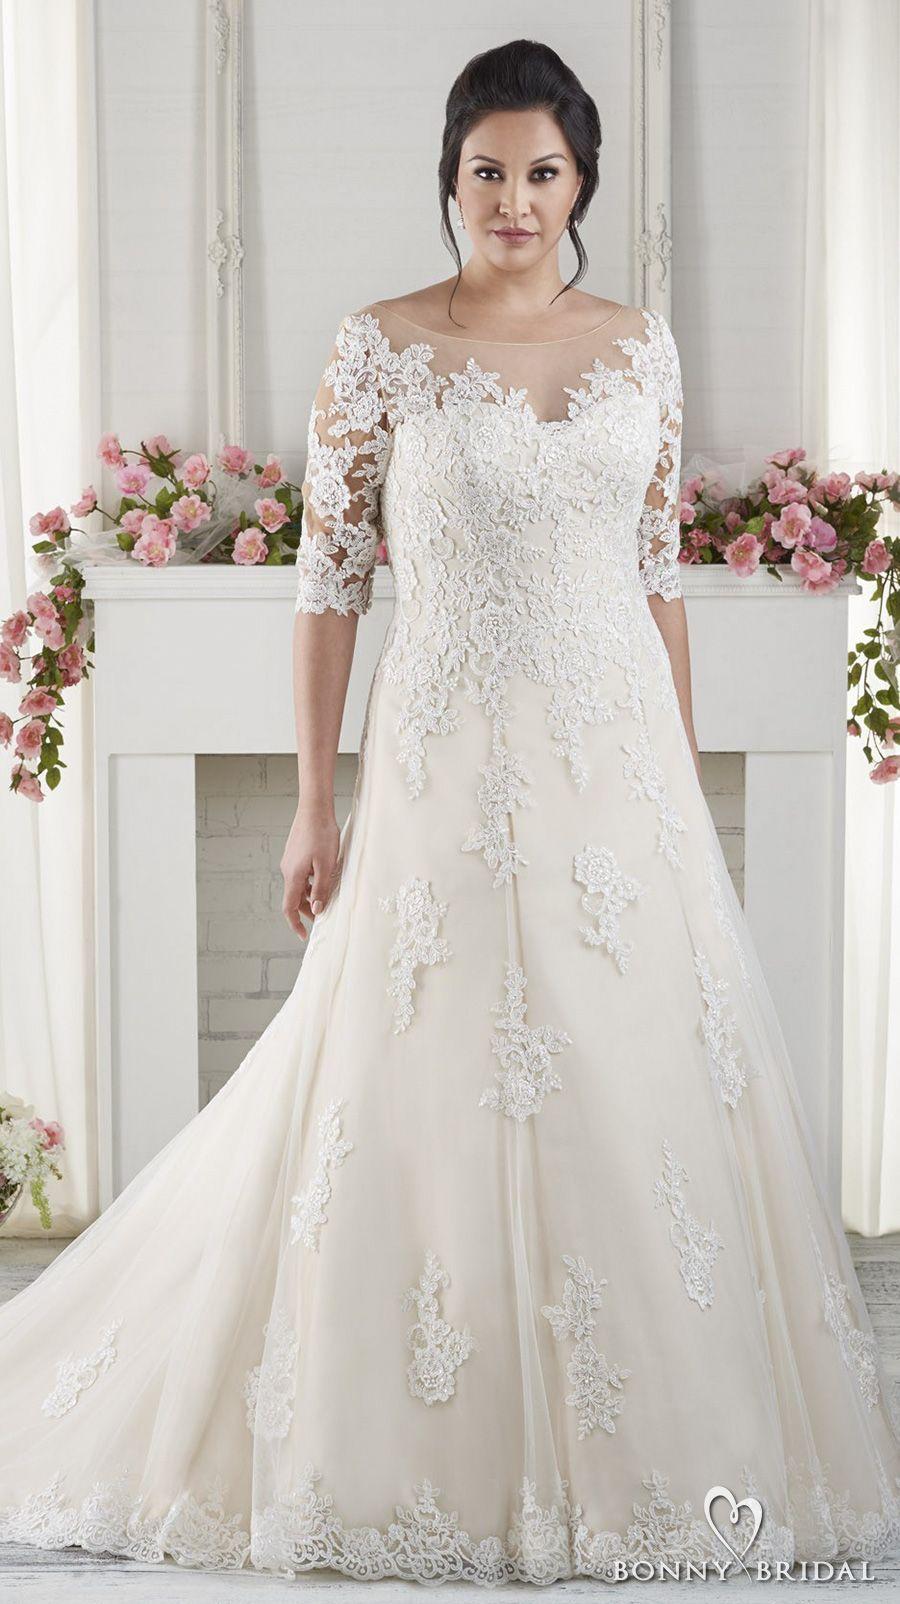 Bonny Bridal Wedding Dresses Unforgettable Styles For Every Bride Wedding Inspirasi Wedding Dress Big Bust Big Wedding Dresses Bonny Bridal Wedding Dresses [ 1604 x 900 Pixel ]